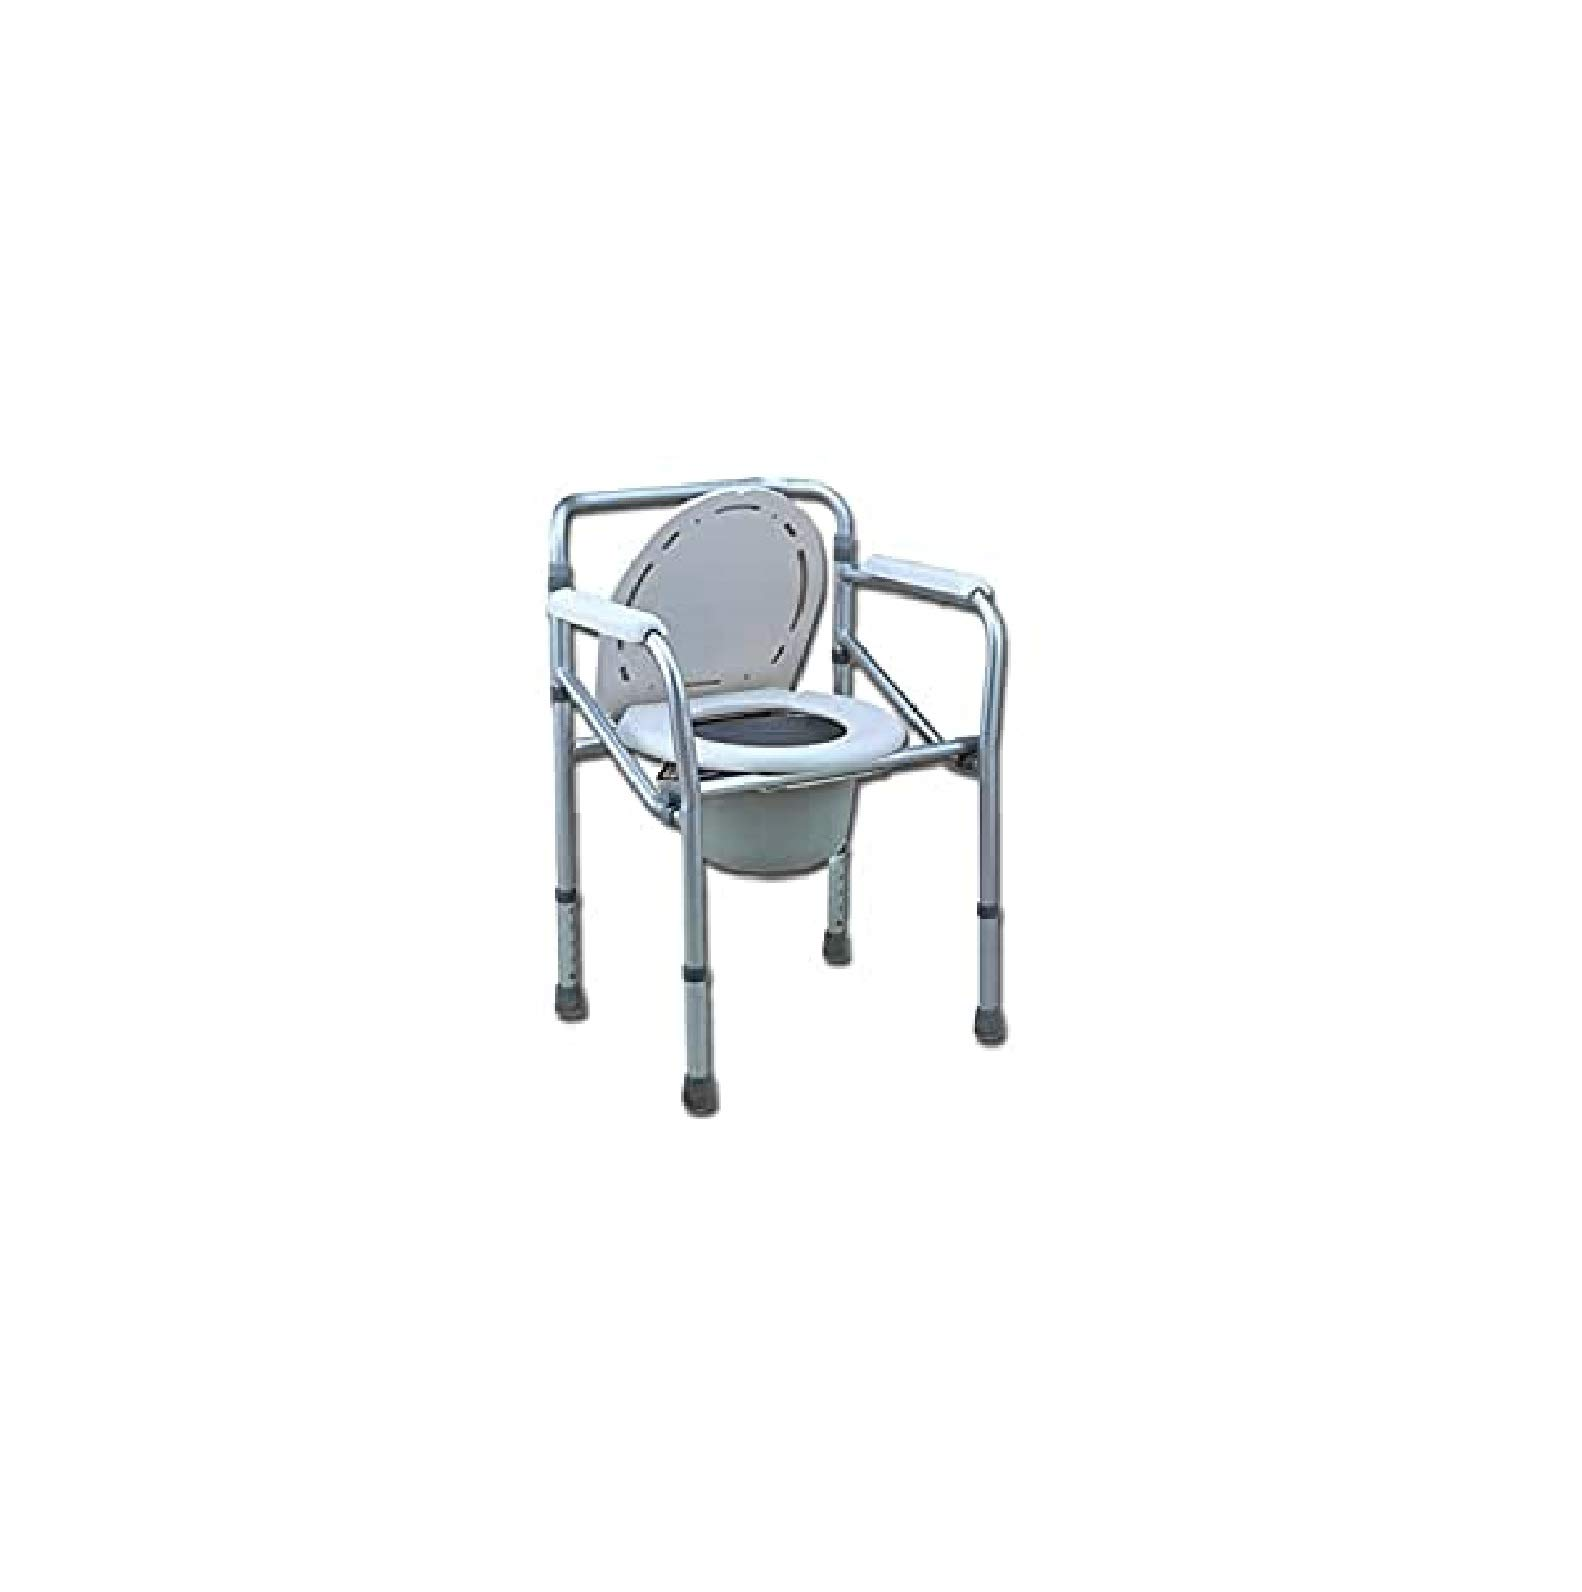 GIMA 27759 Toilet Comfortable Shower Commode